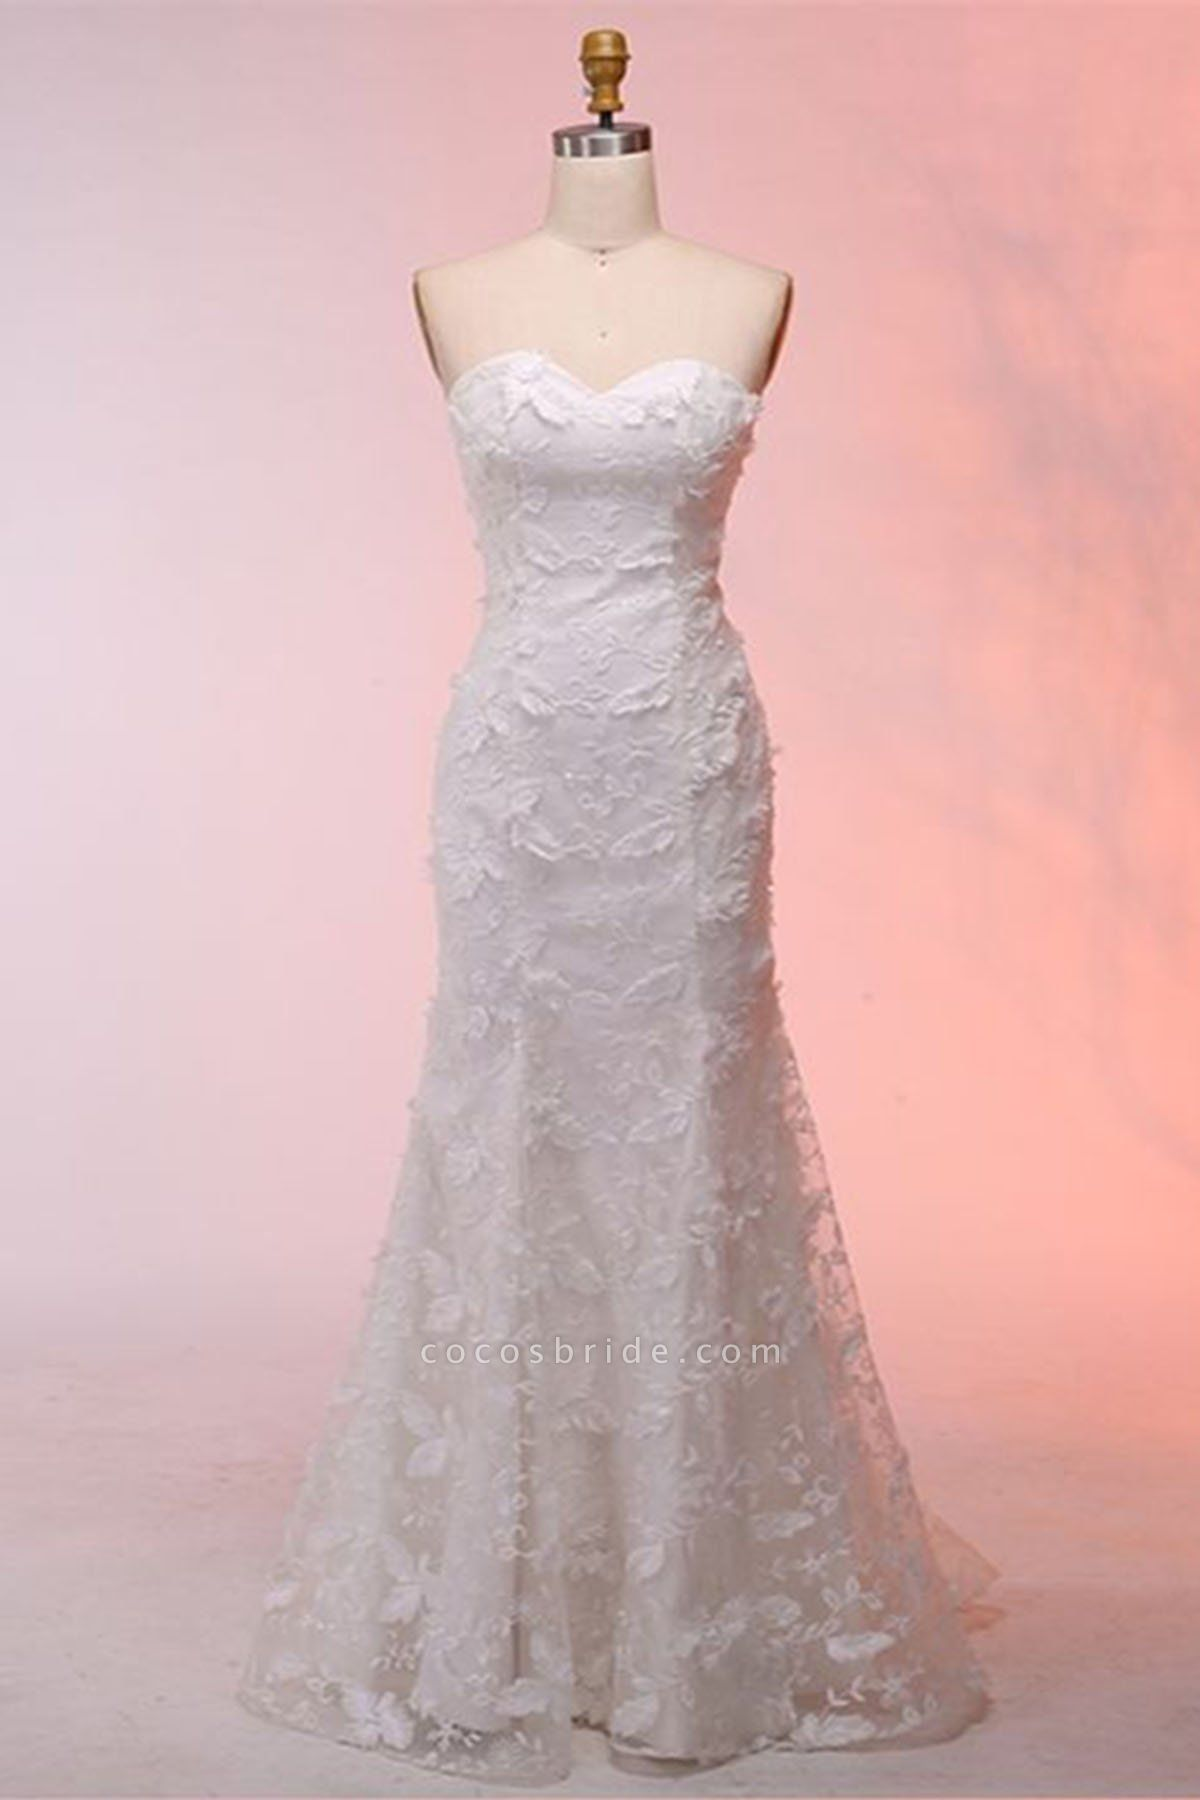 White 3D Lace Sweetheart Neck Long Mermaid Wedding Dress